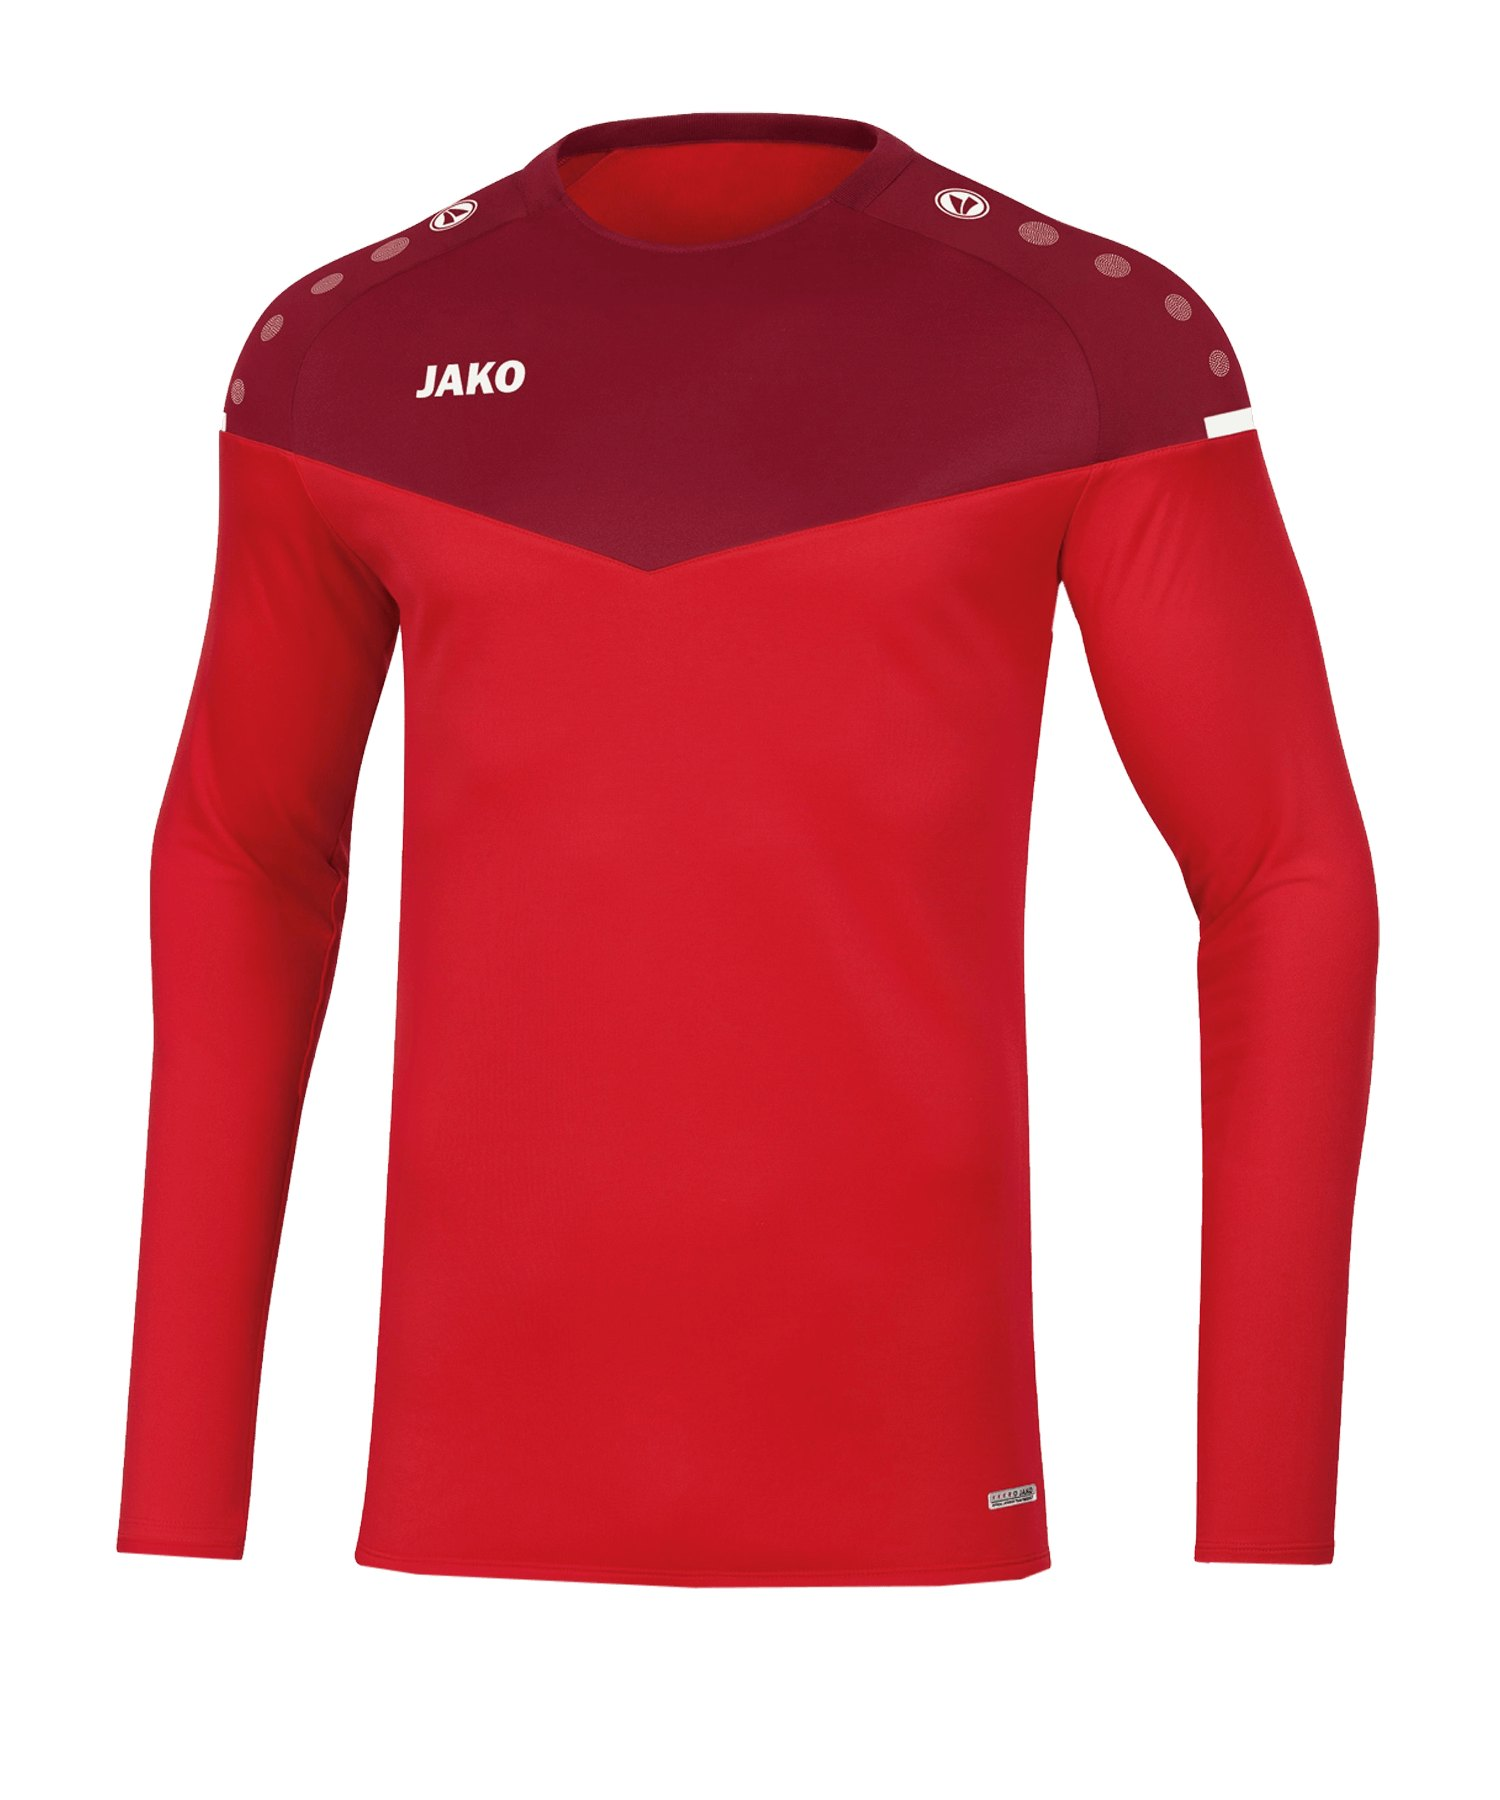 Jako Champ 2.0 Sweatshirt Kids Rot F01 - rot